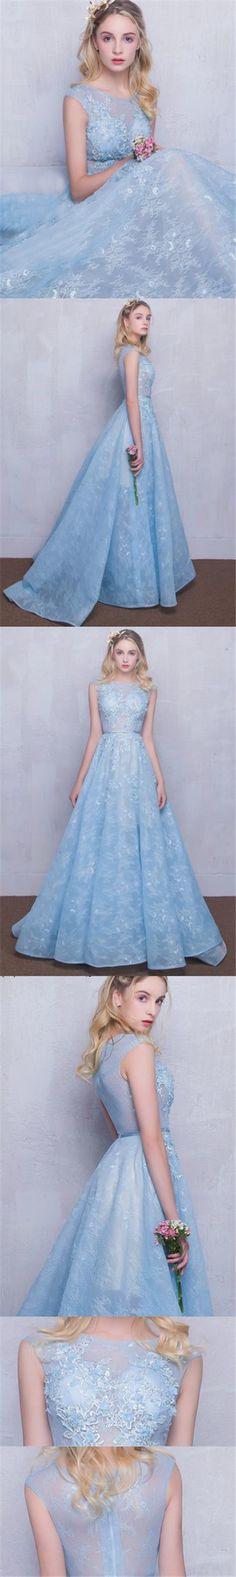 Long Lace Prom Dresses Scoop Appliques Baby Blue Prom Dress/Evening Dress JKL262#lacedress  #lace #lacepromdress #longdress #longpromdress #bluedress #light sky bleu #dance #dancewear #dancedress